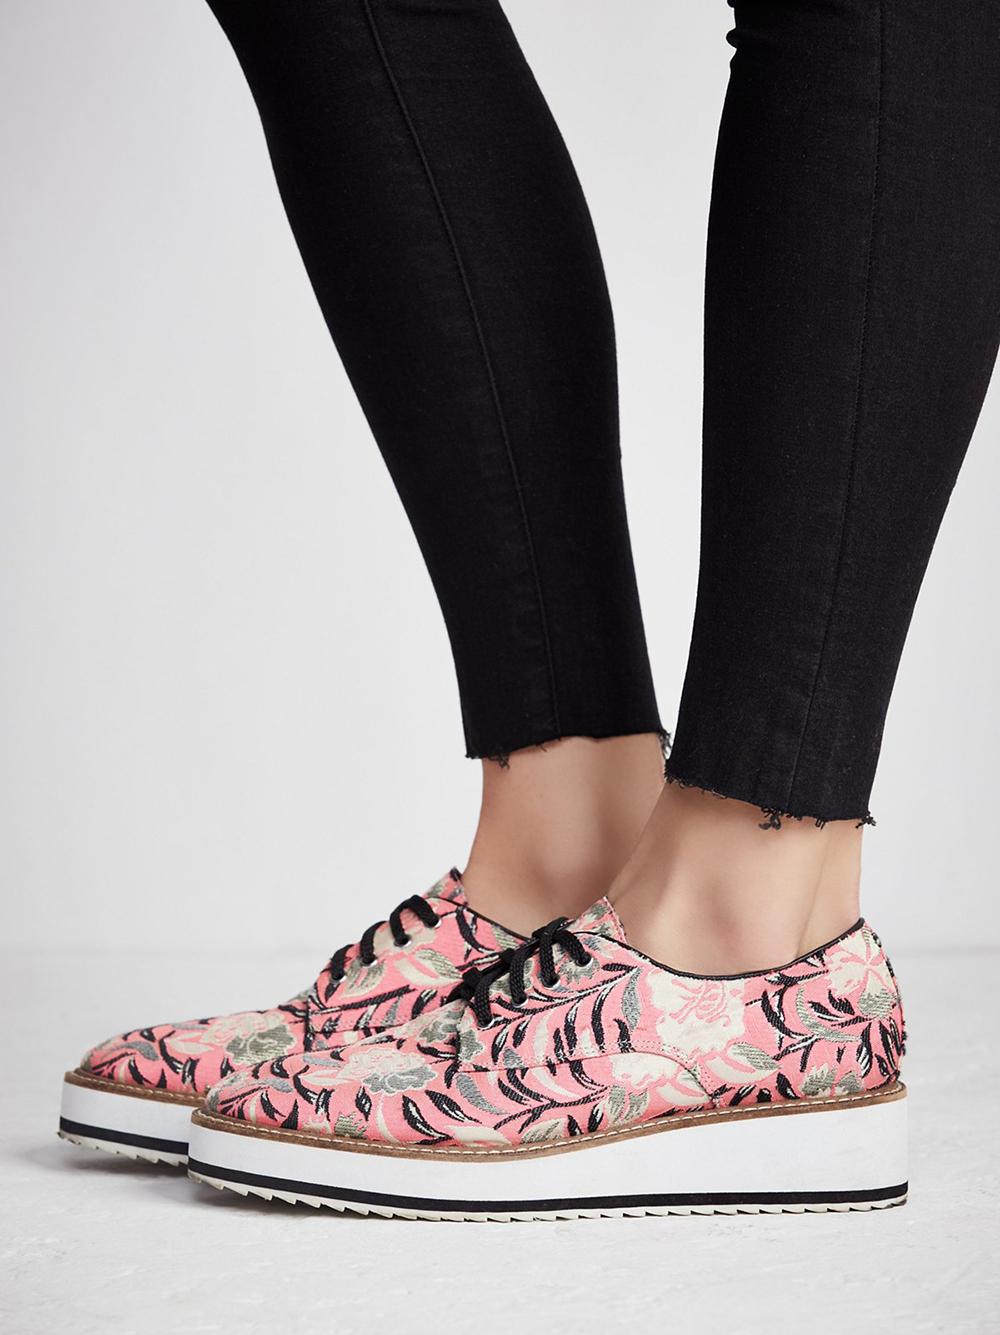 Shellys London x Free People Delfina Platform Loafer - Statement shoes